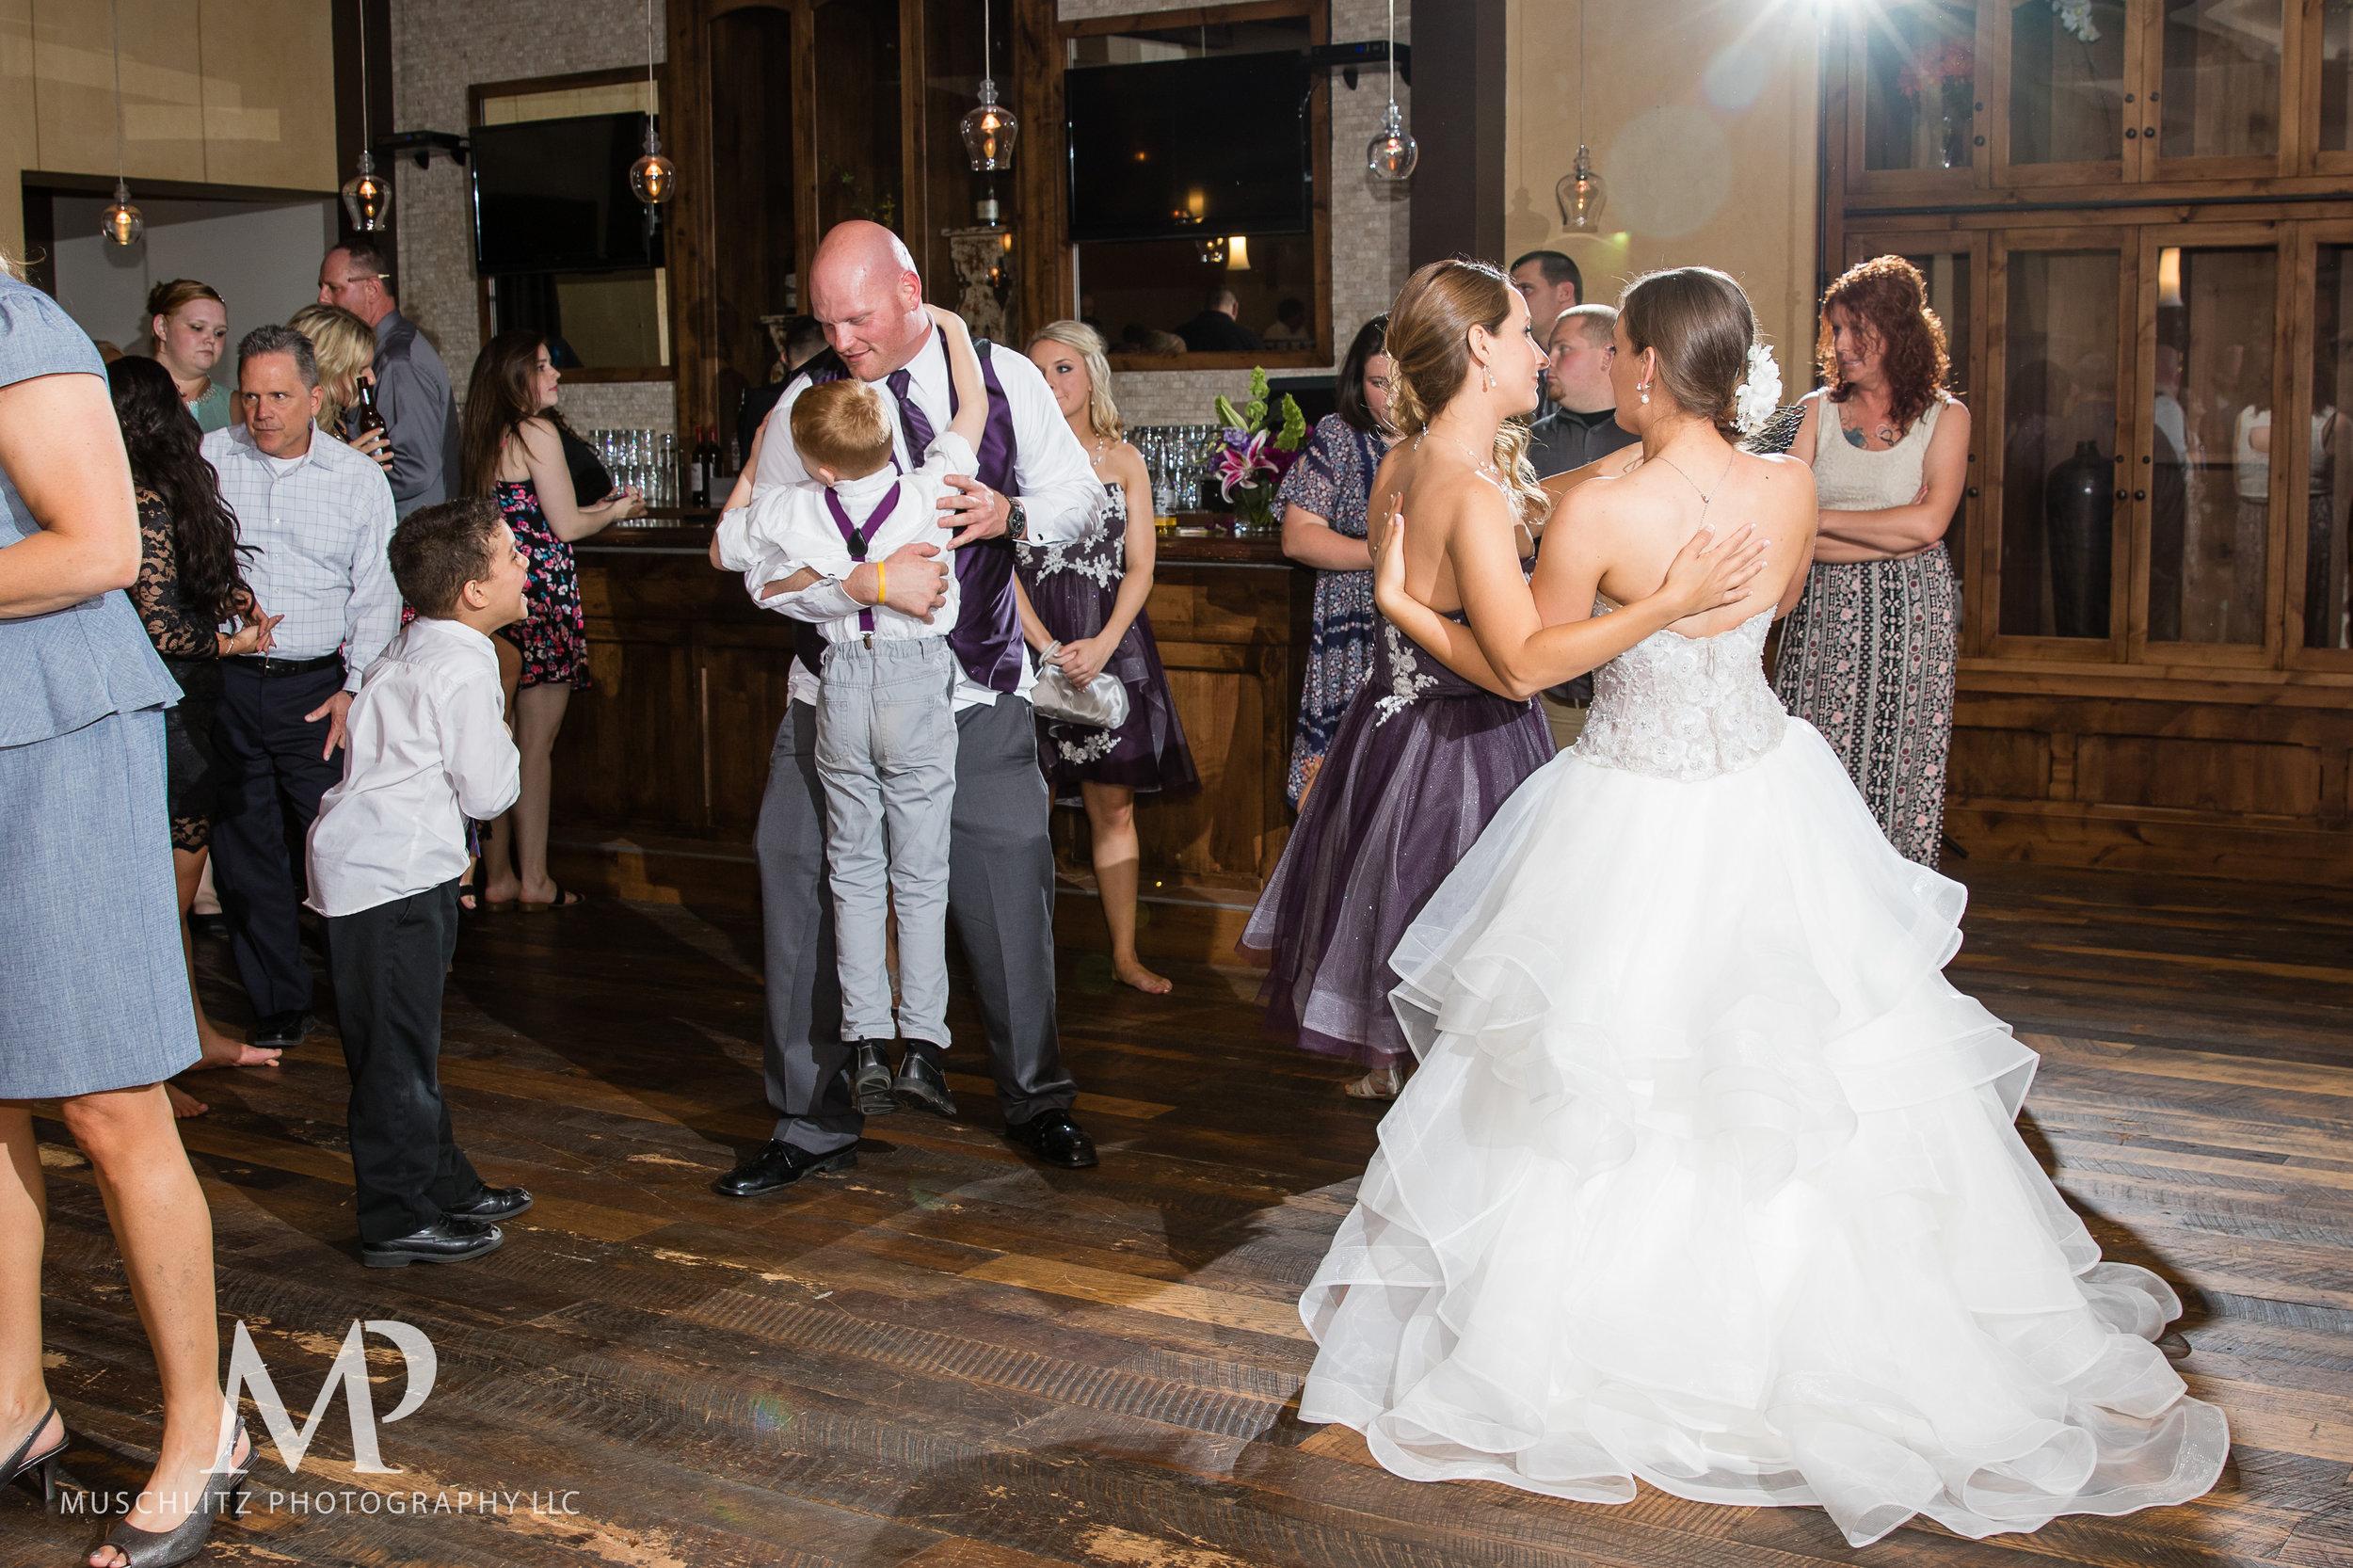 club-at-corazon-wedding-ceremony-reception-columbus-dublin-ohio-ohio-university-theme-088.JPG